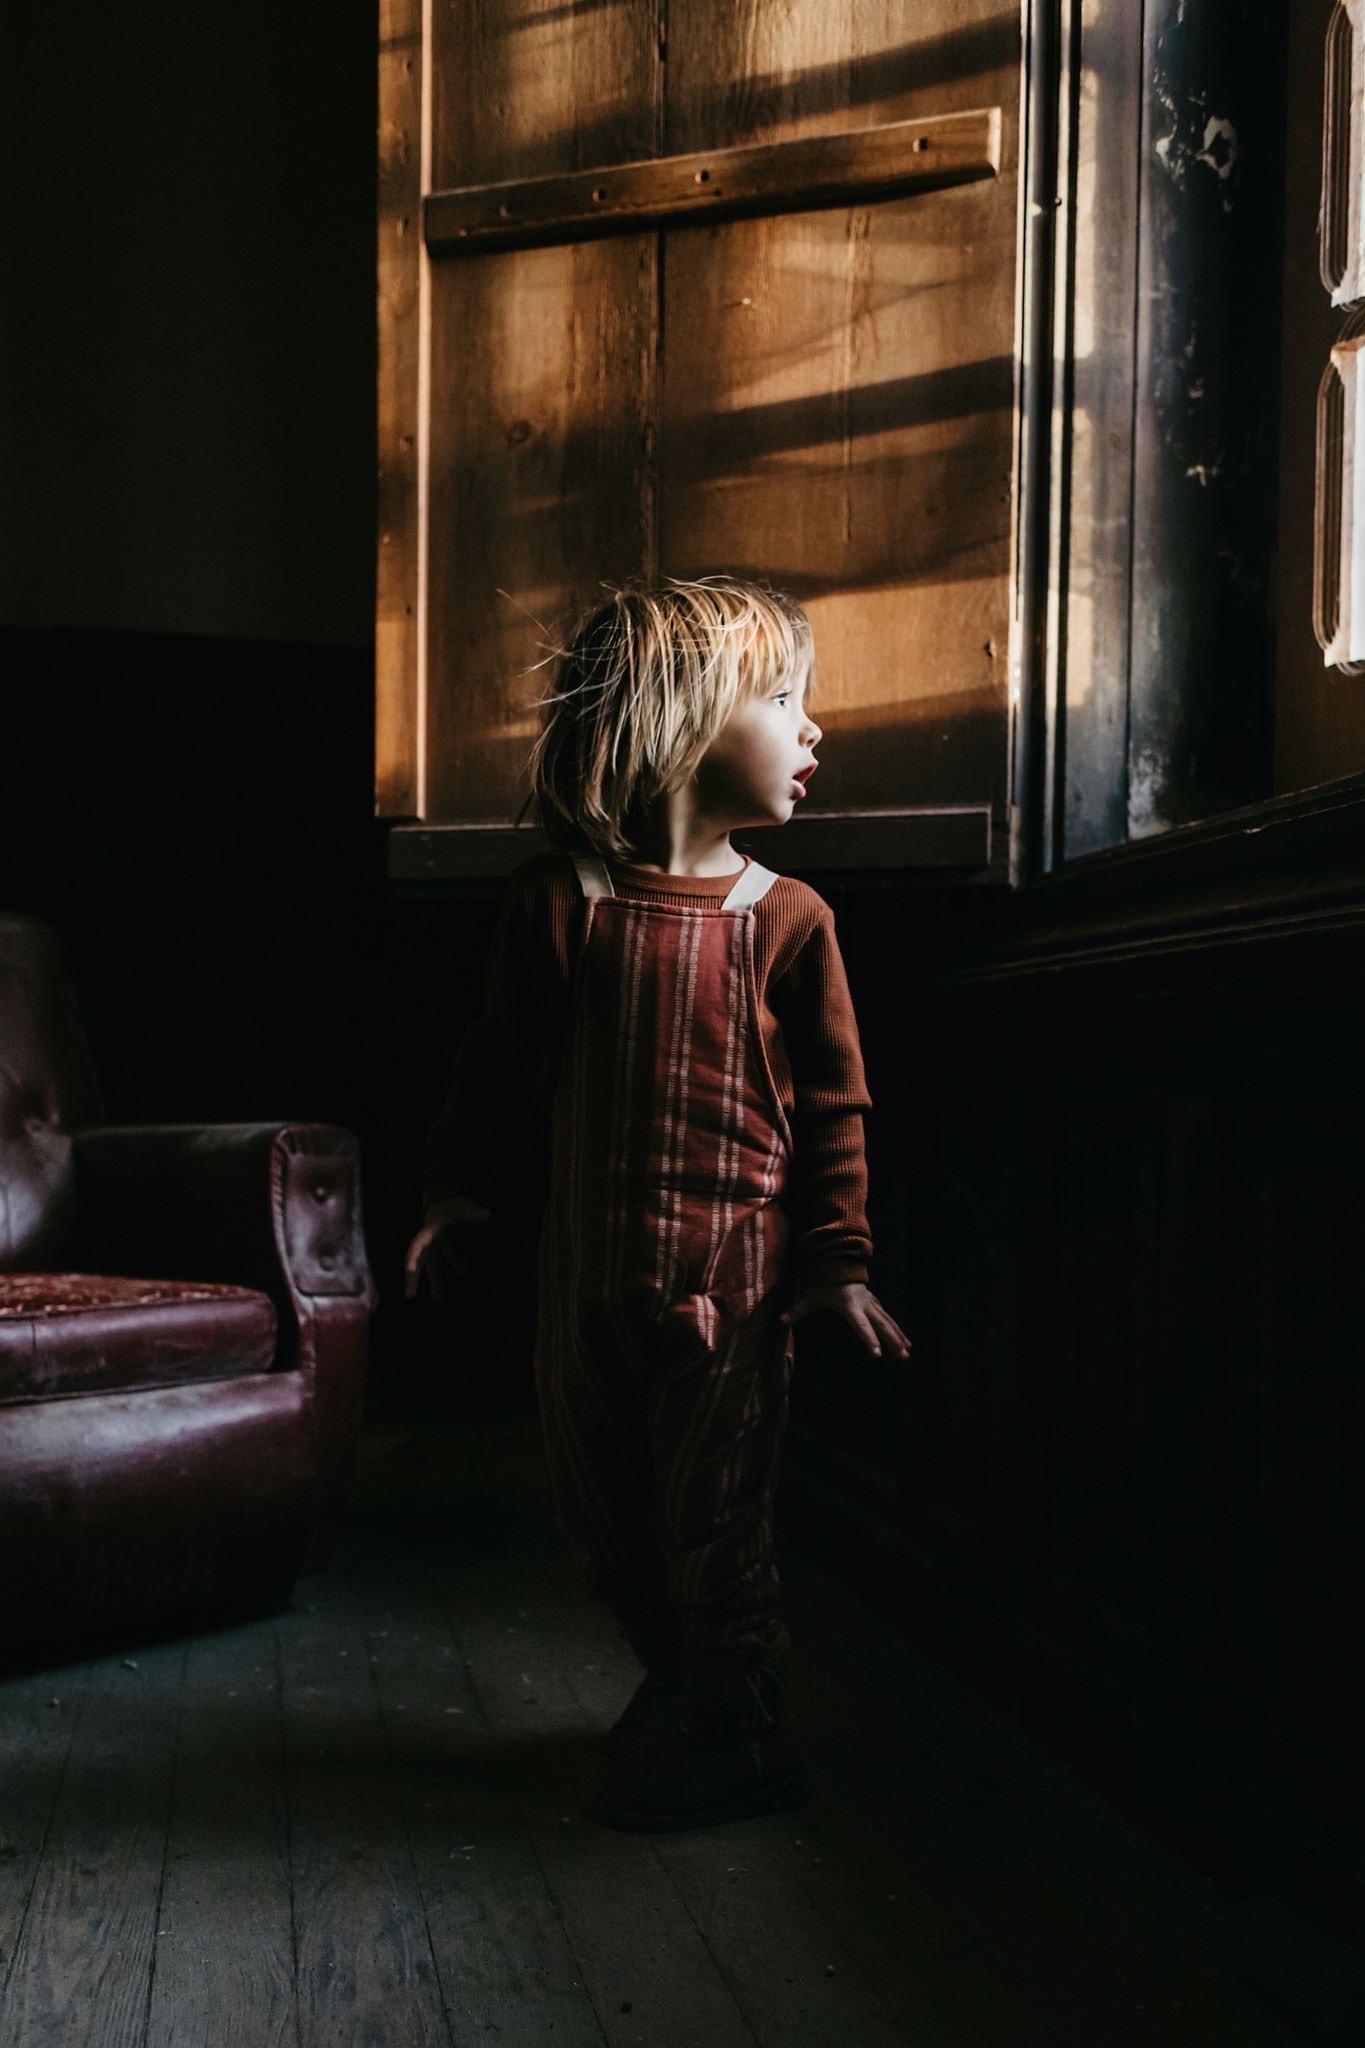 niño en ventana